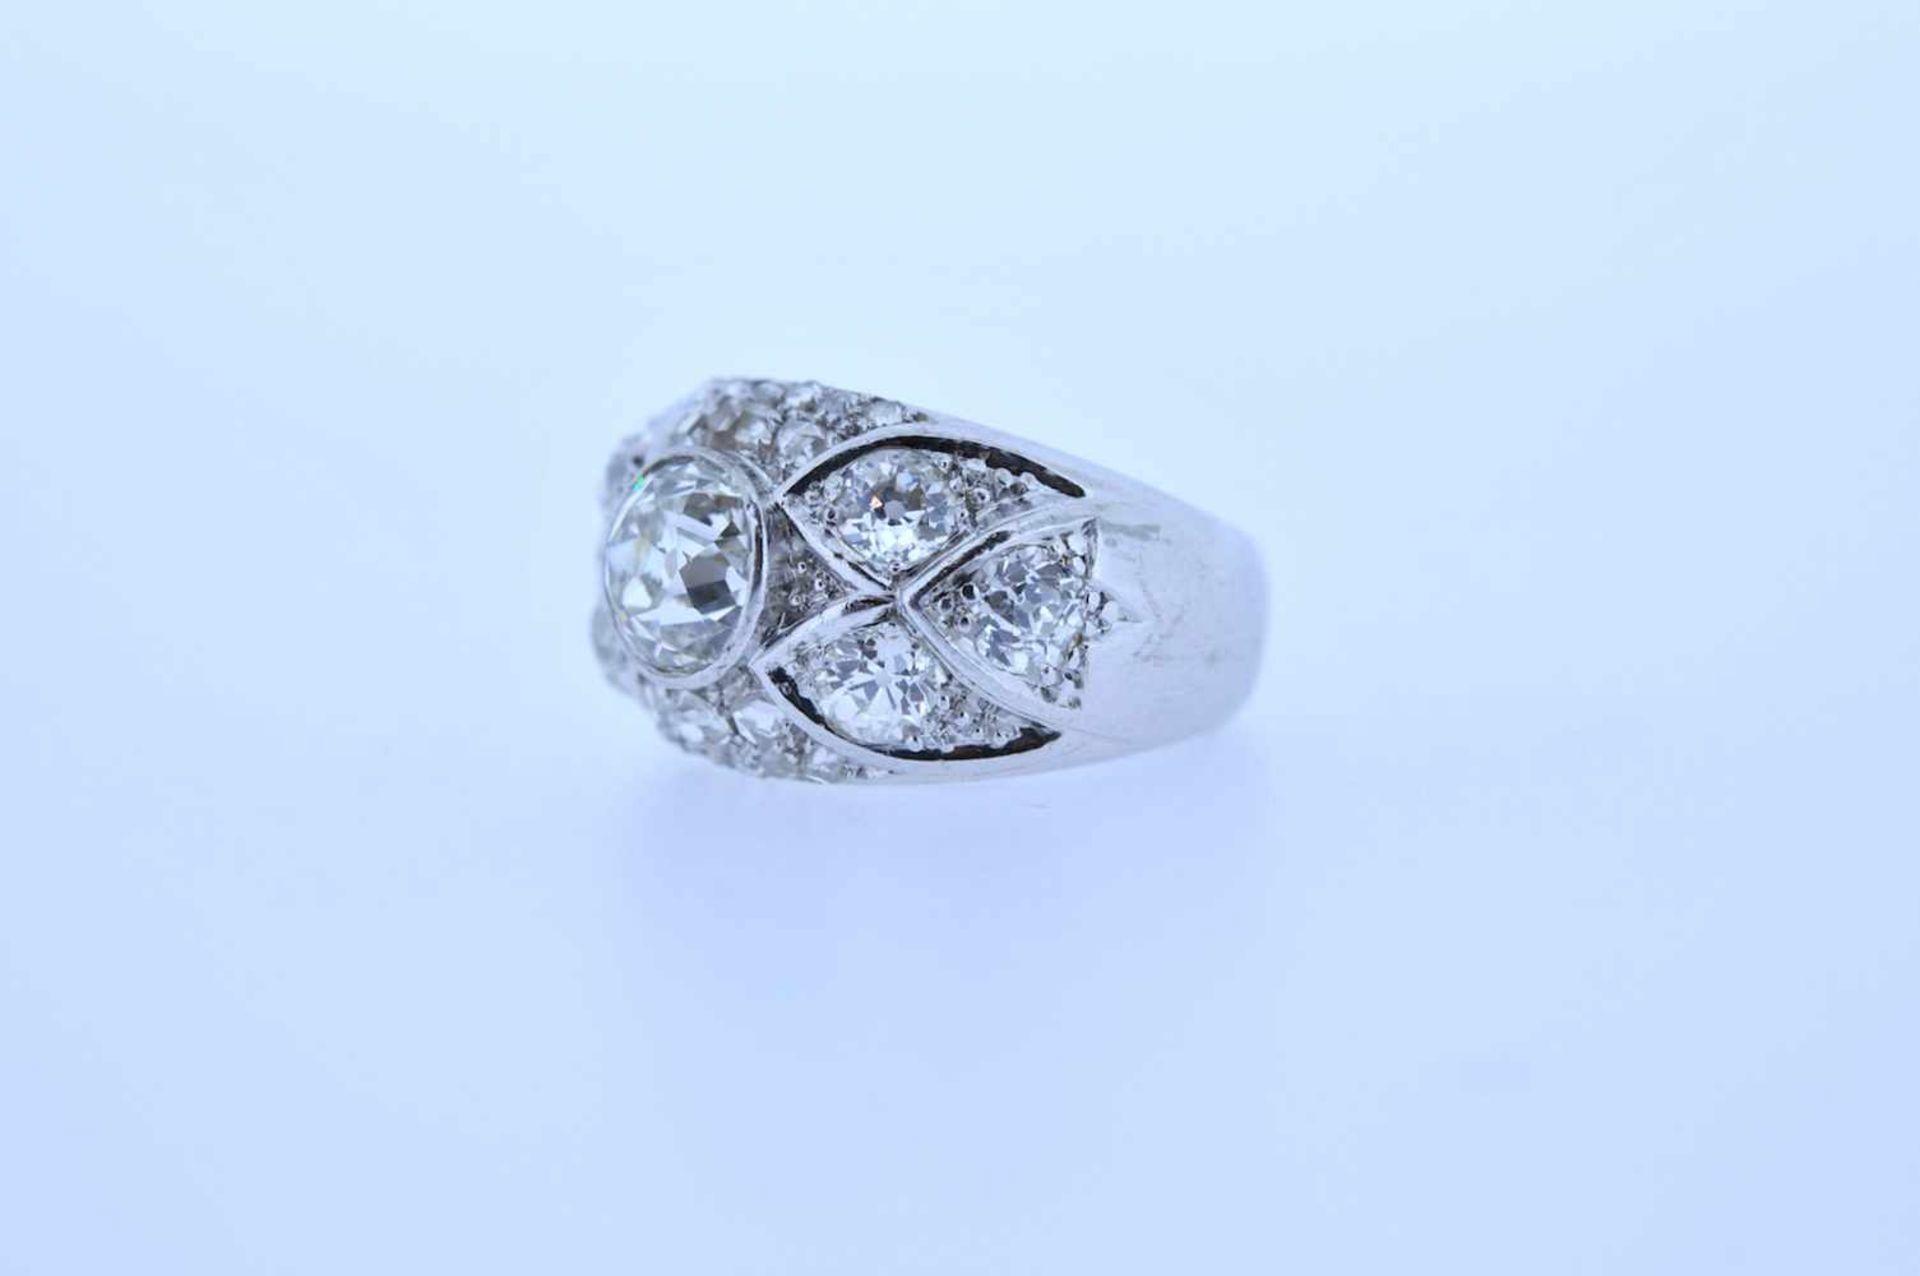 Los 48 - Ring Platin Ring mit Altschliffdiamanten, zus.ca. 2 ct, Ringweite 52, 11,24 g. Ring Ring with old